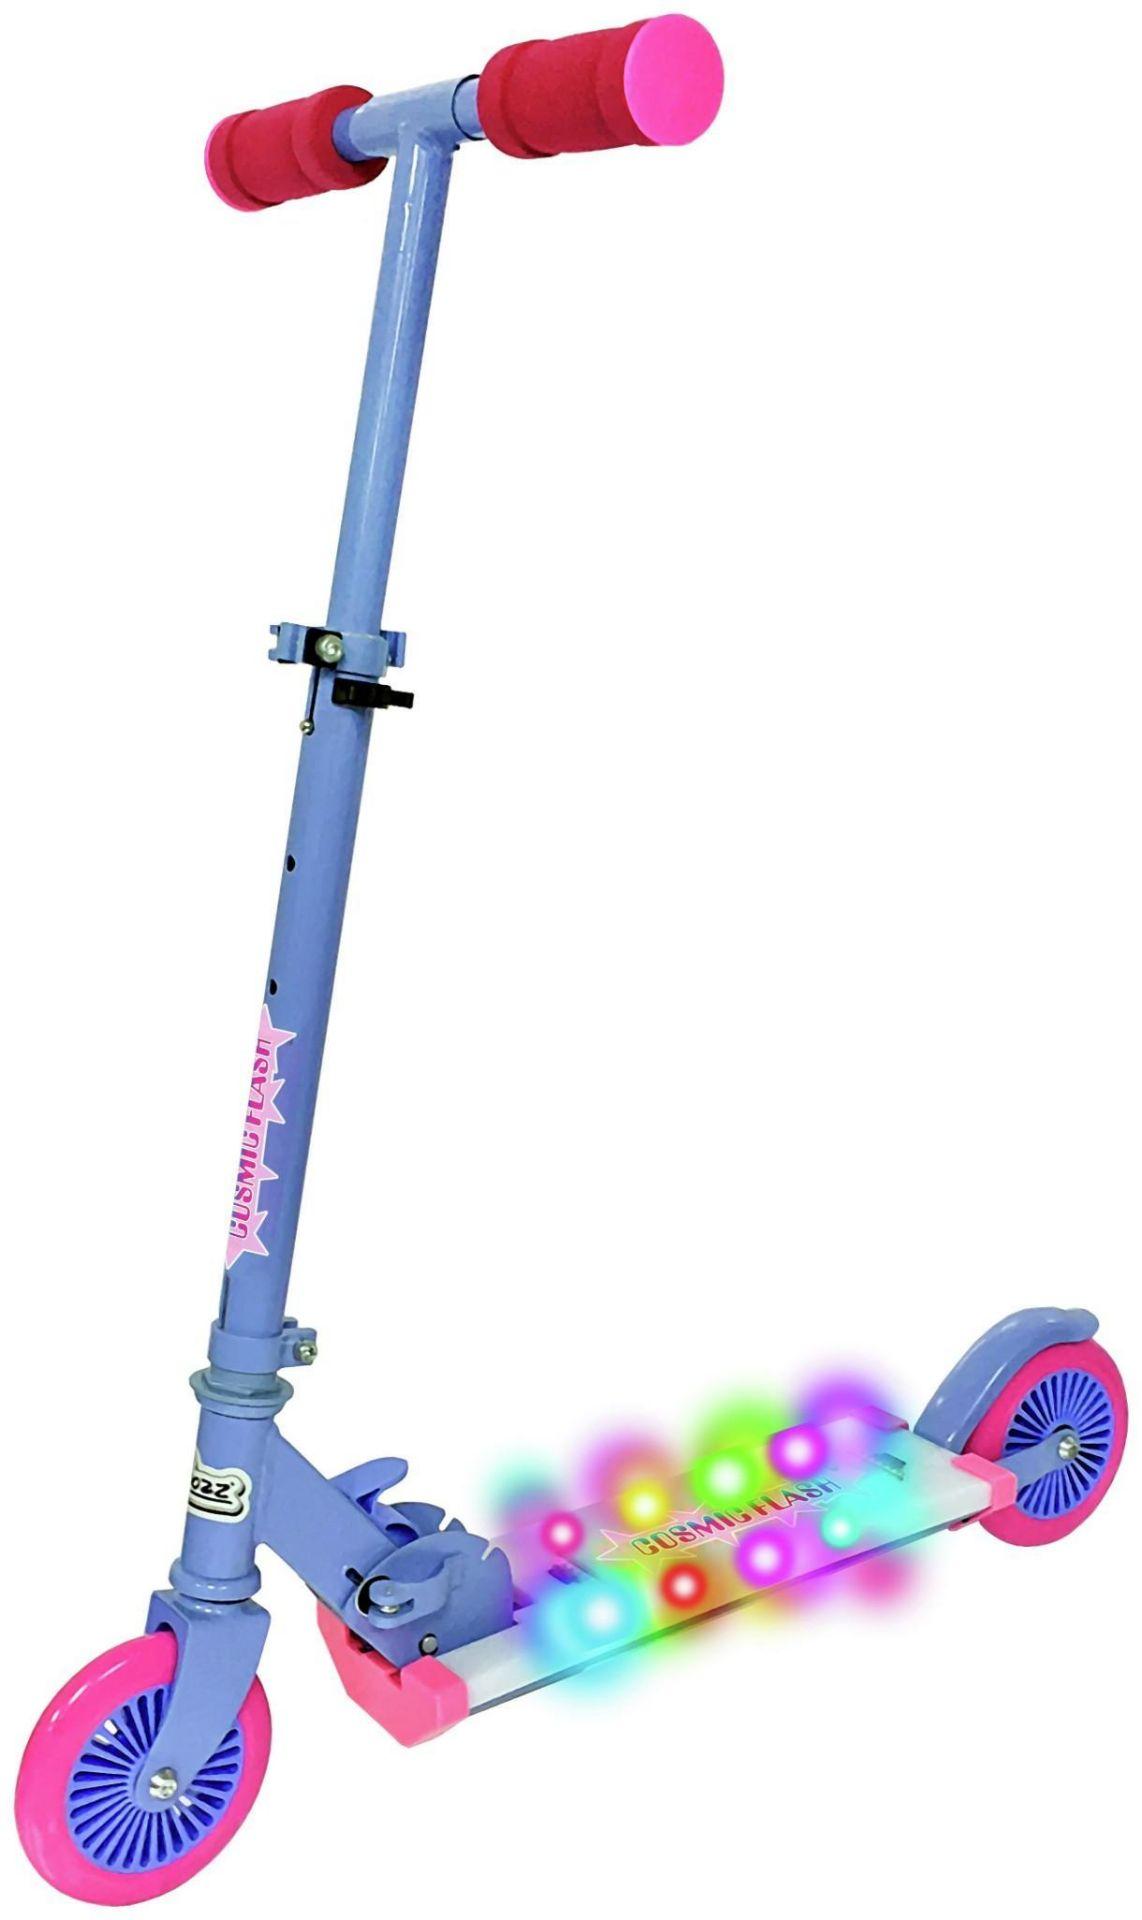 Ozbozz Cosmic Scooter - Light Pink, £29.99 RRP